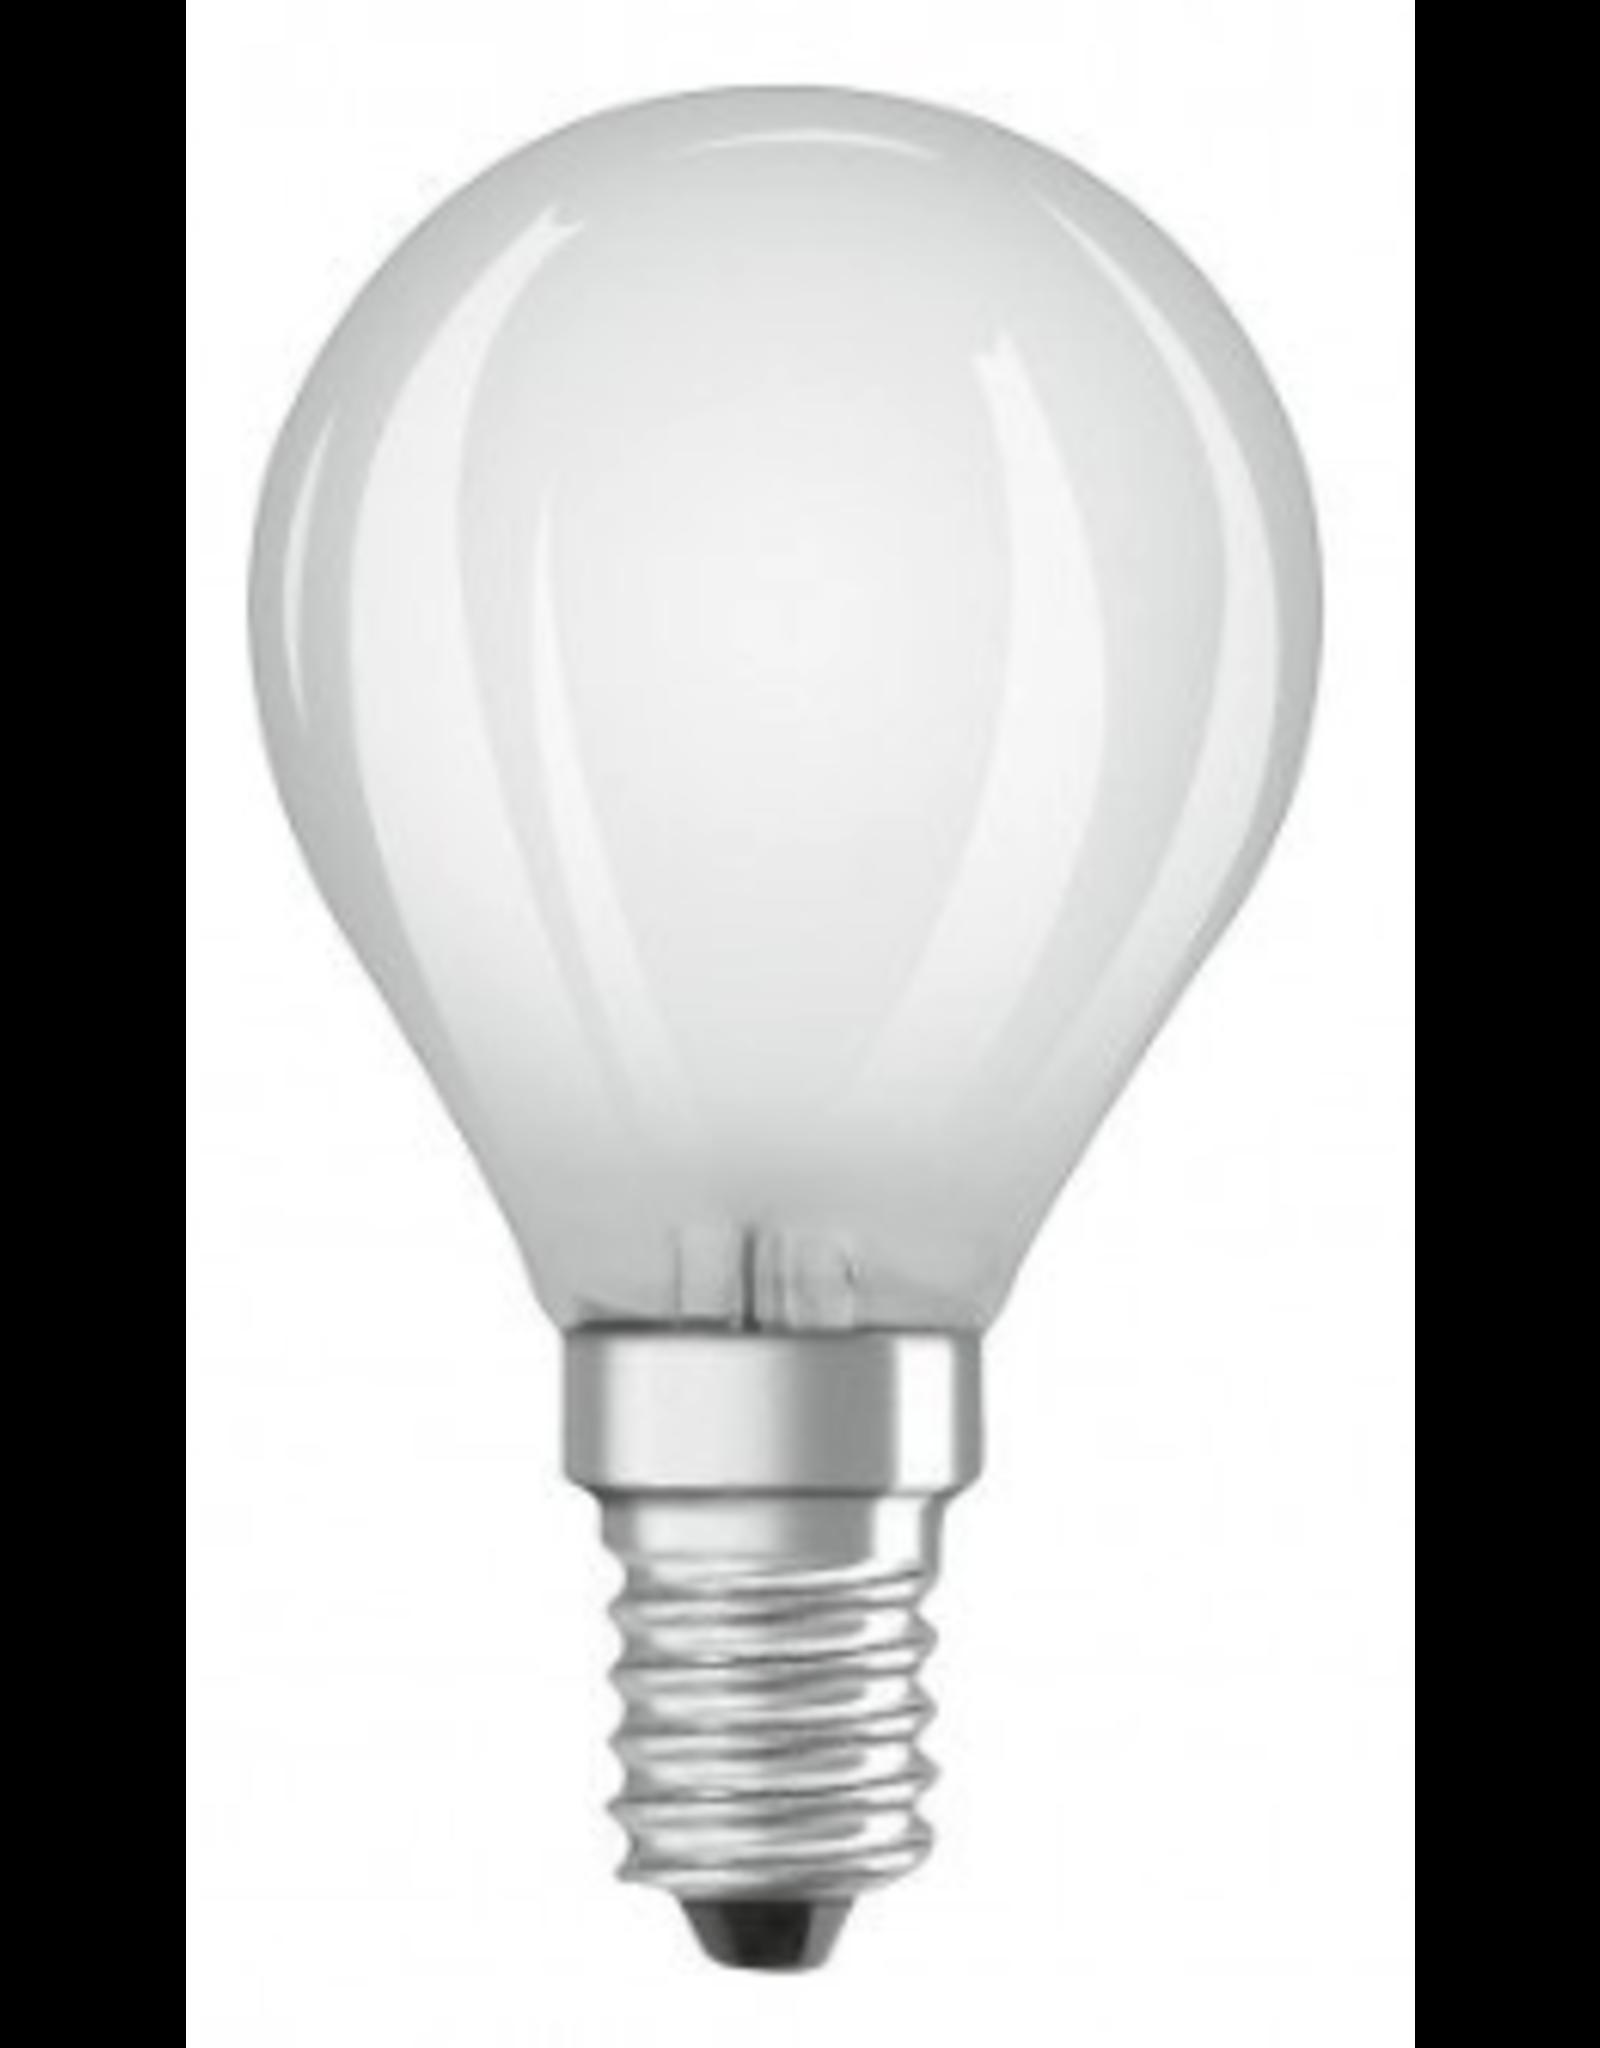 Led Bolvorm - kleine fitting - niet dimbaar - warm wit - 40 -> 4,5 watt